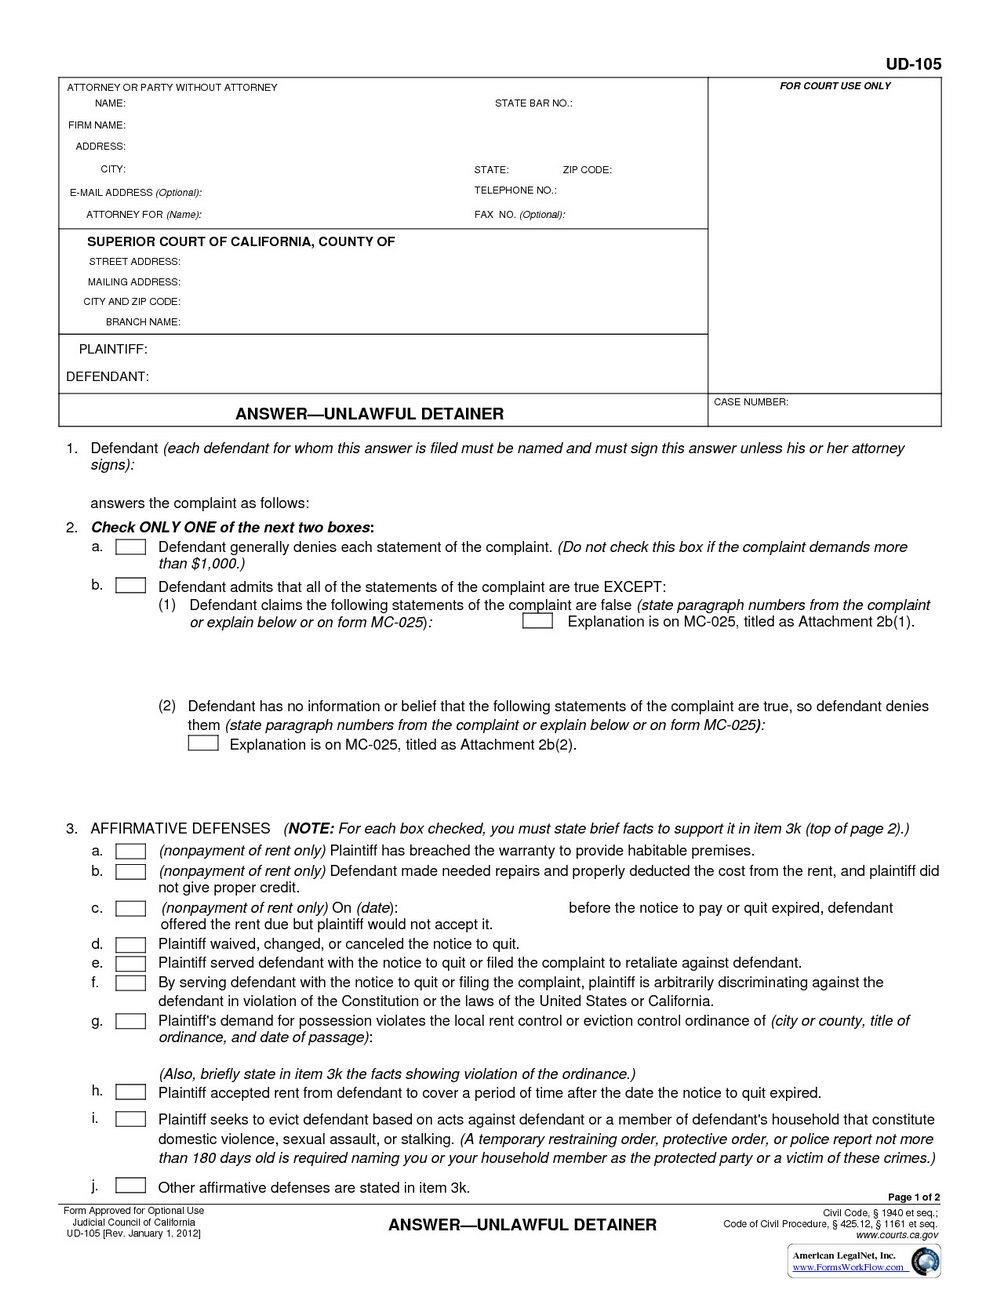 Unlawful Detainer Forms Washington State